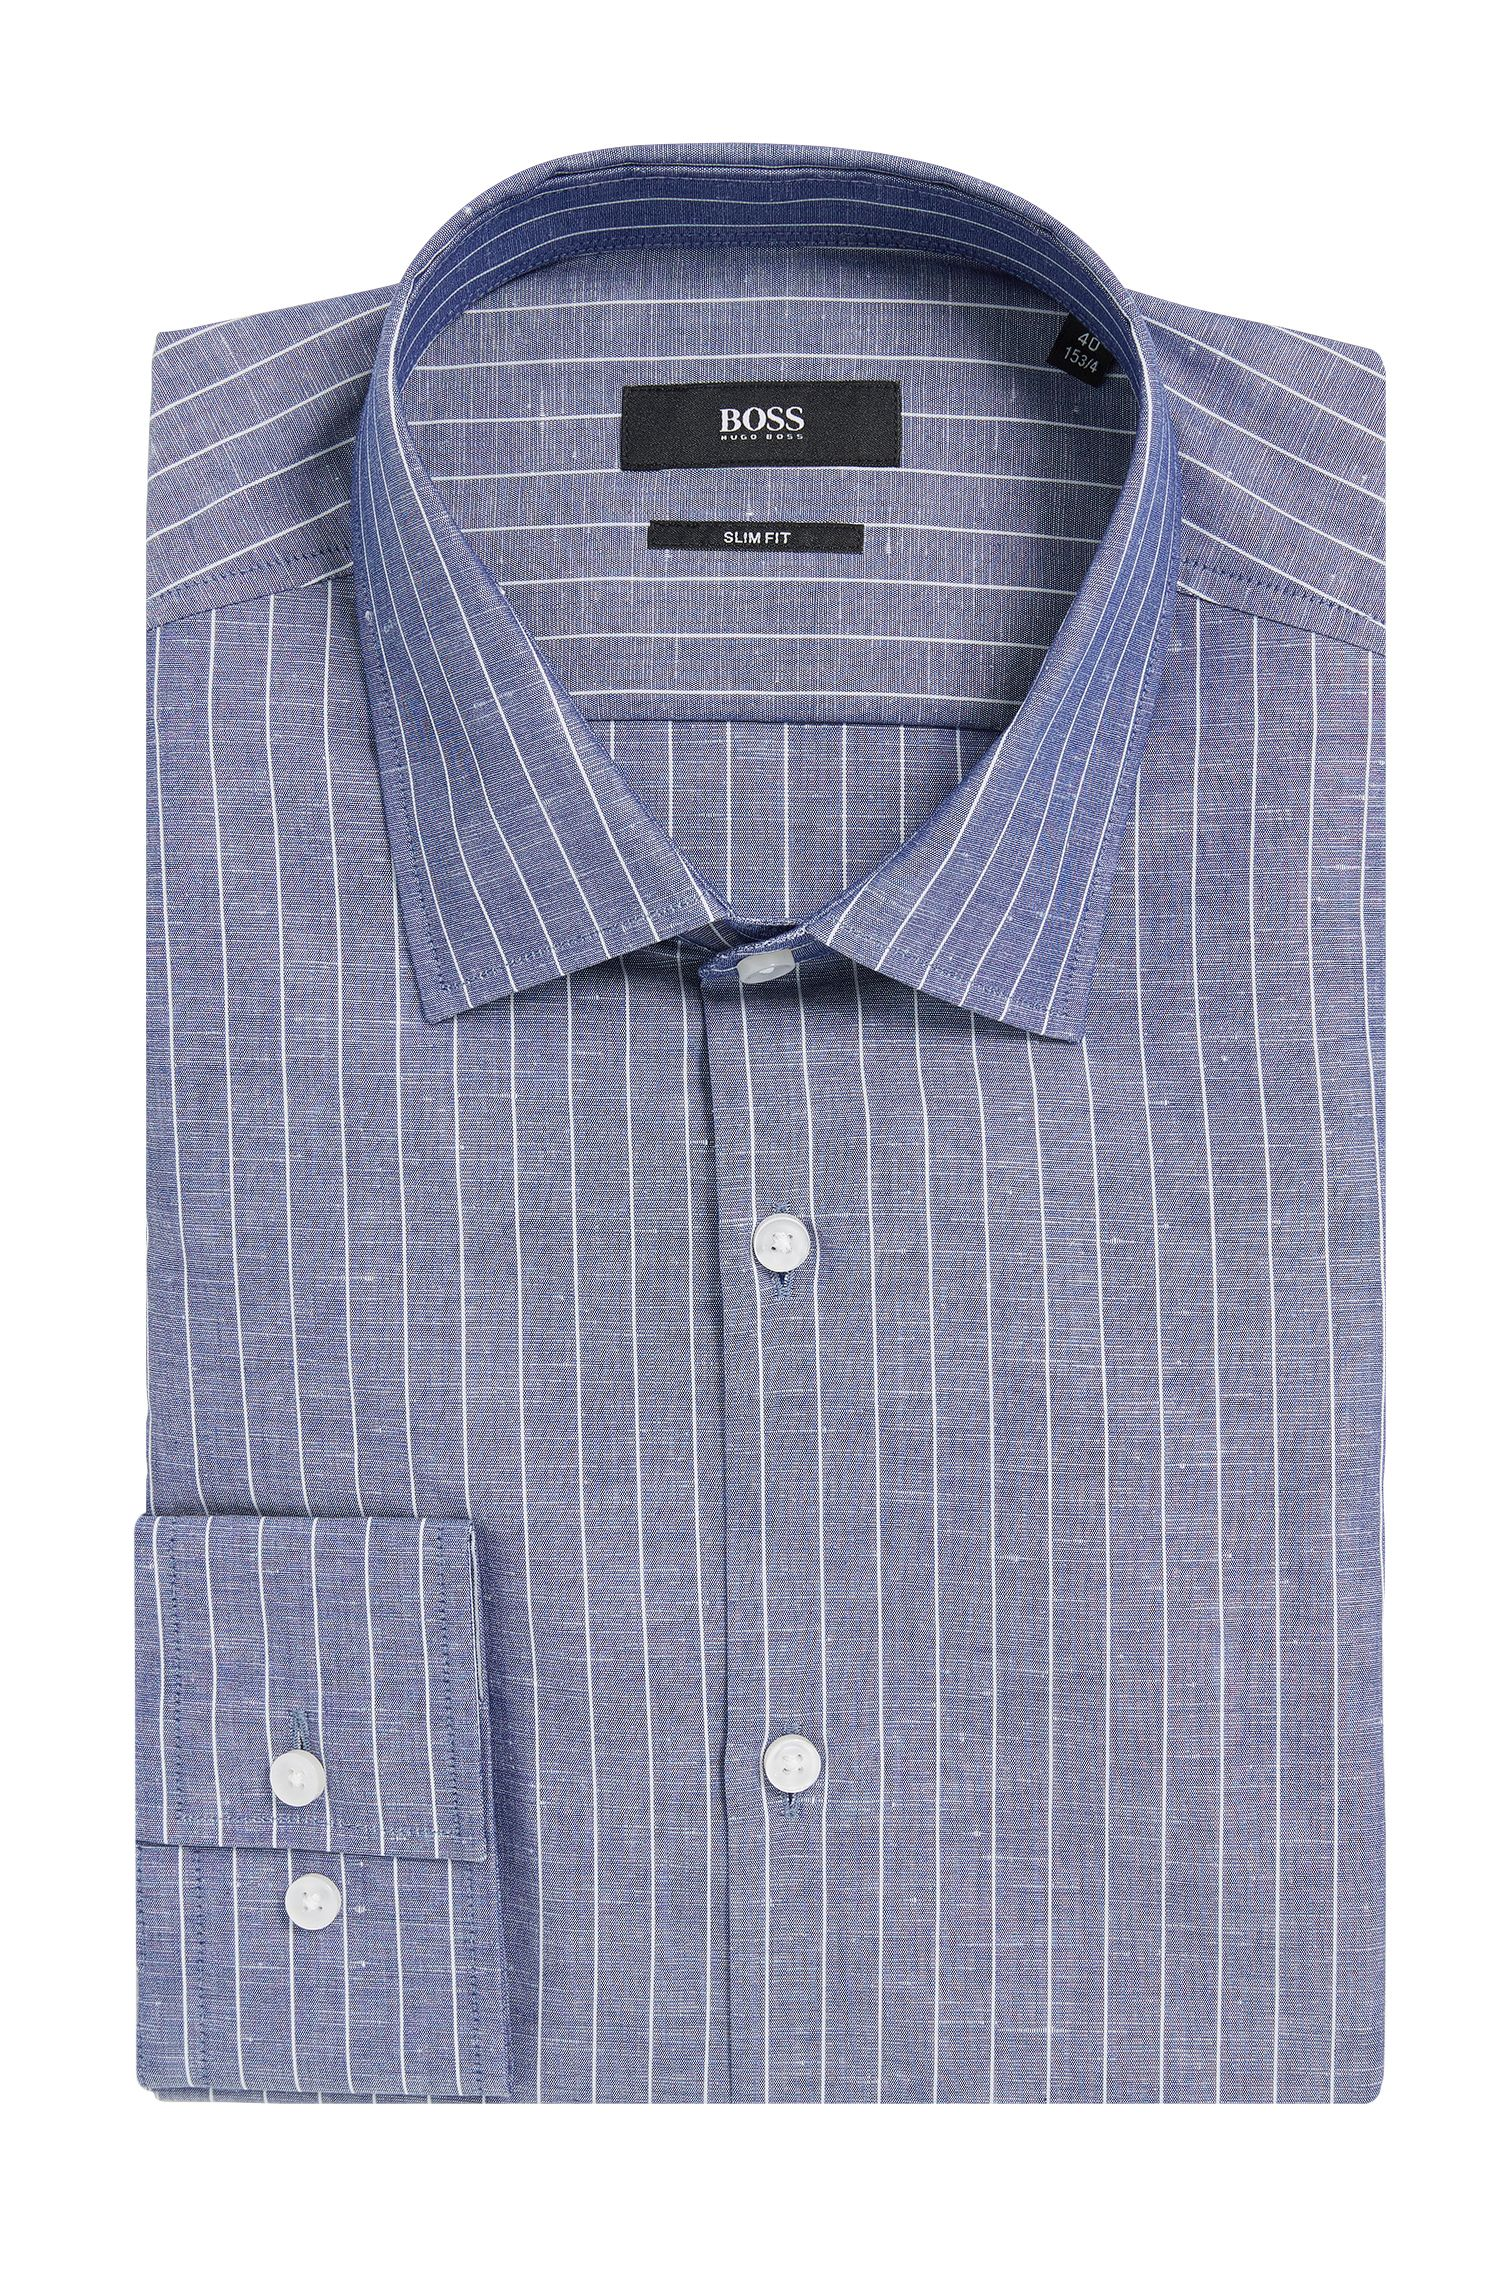 'Jenno' | Slim Fit, Italian Cotton Linen Dress Shirt